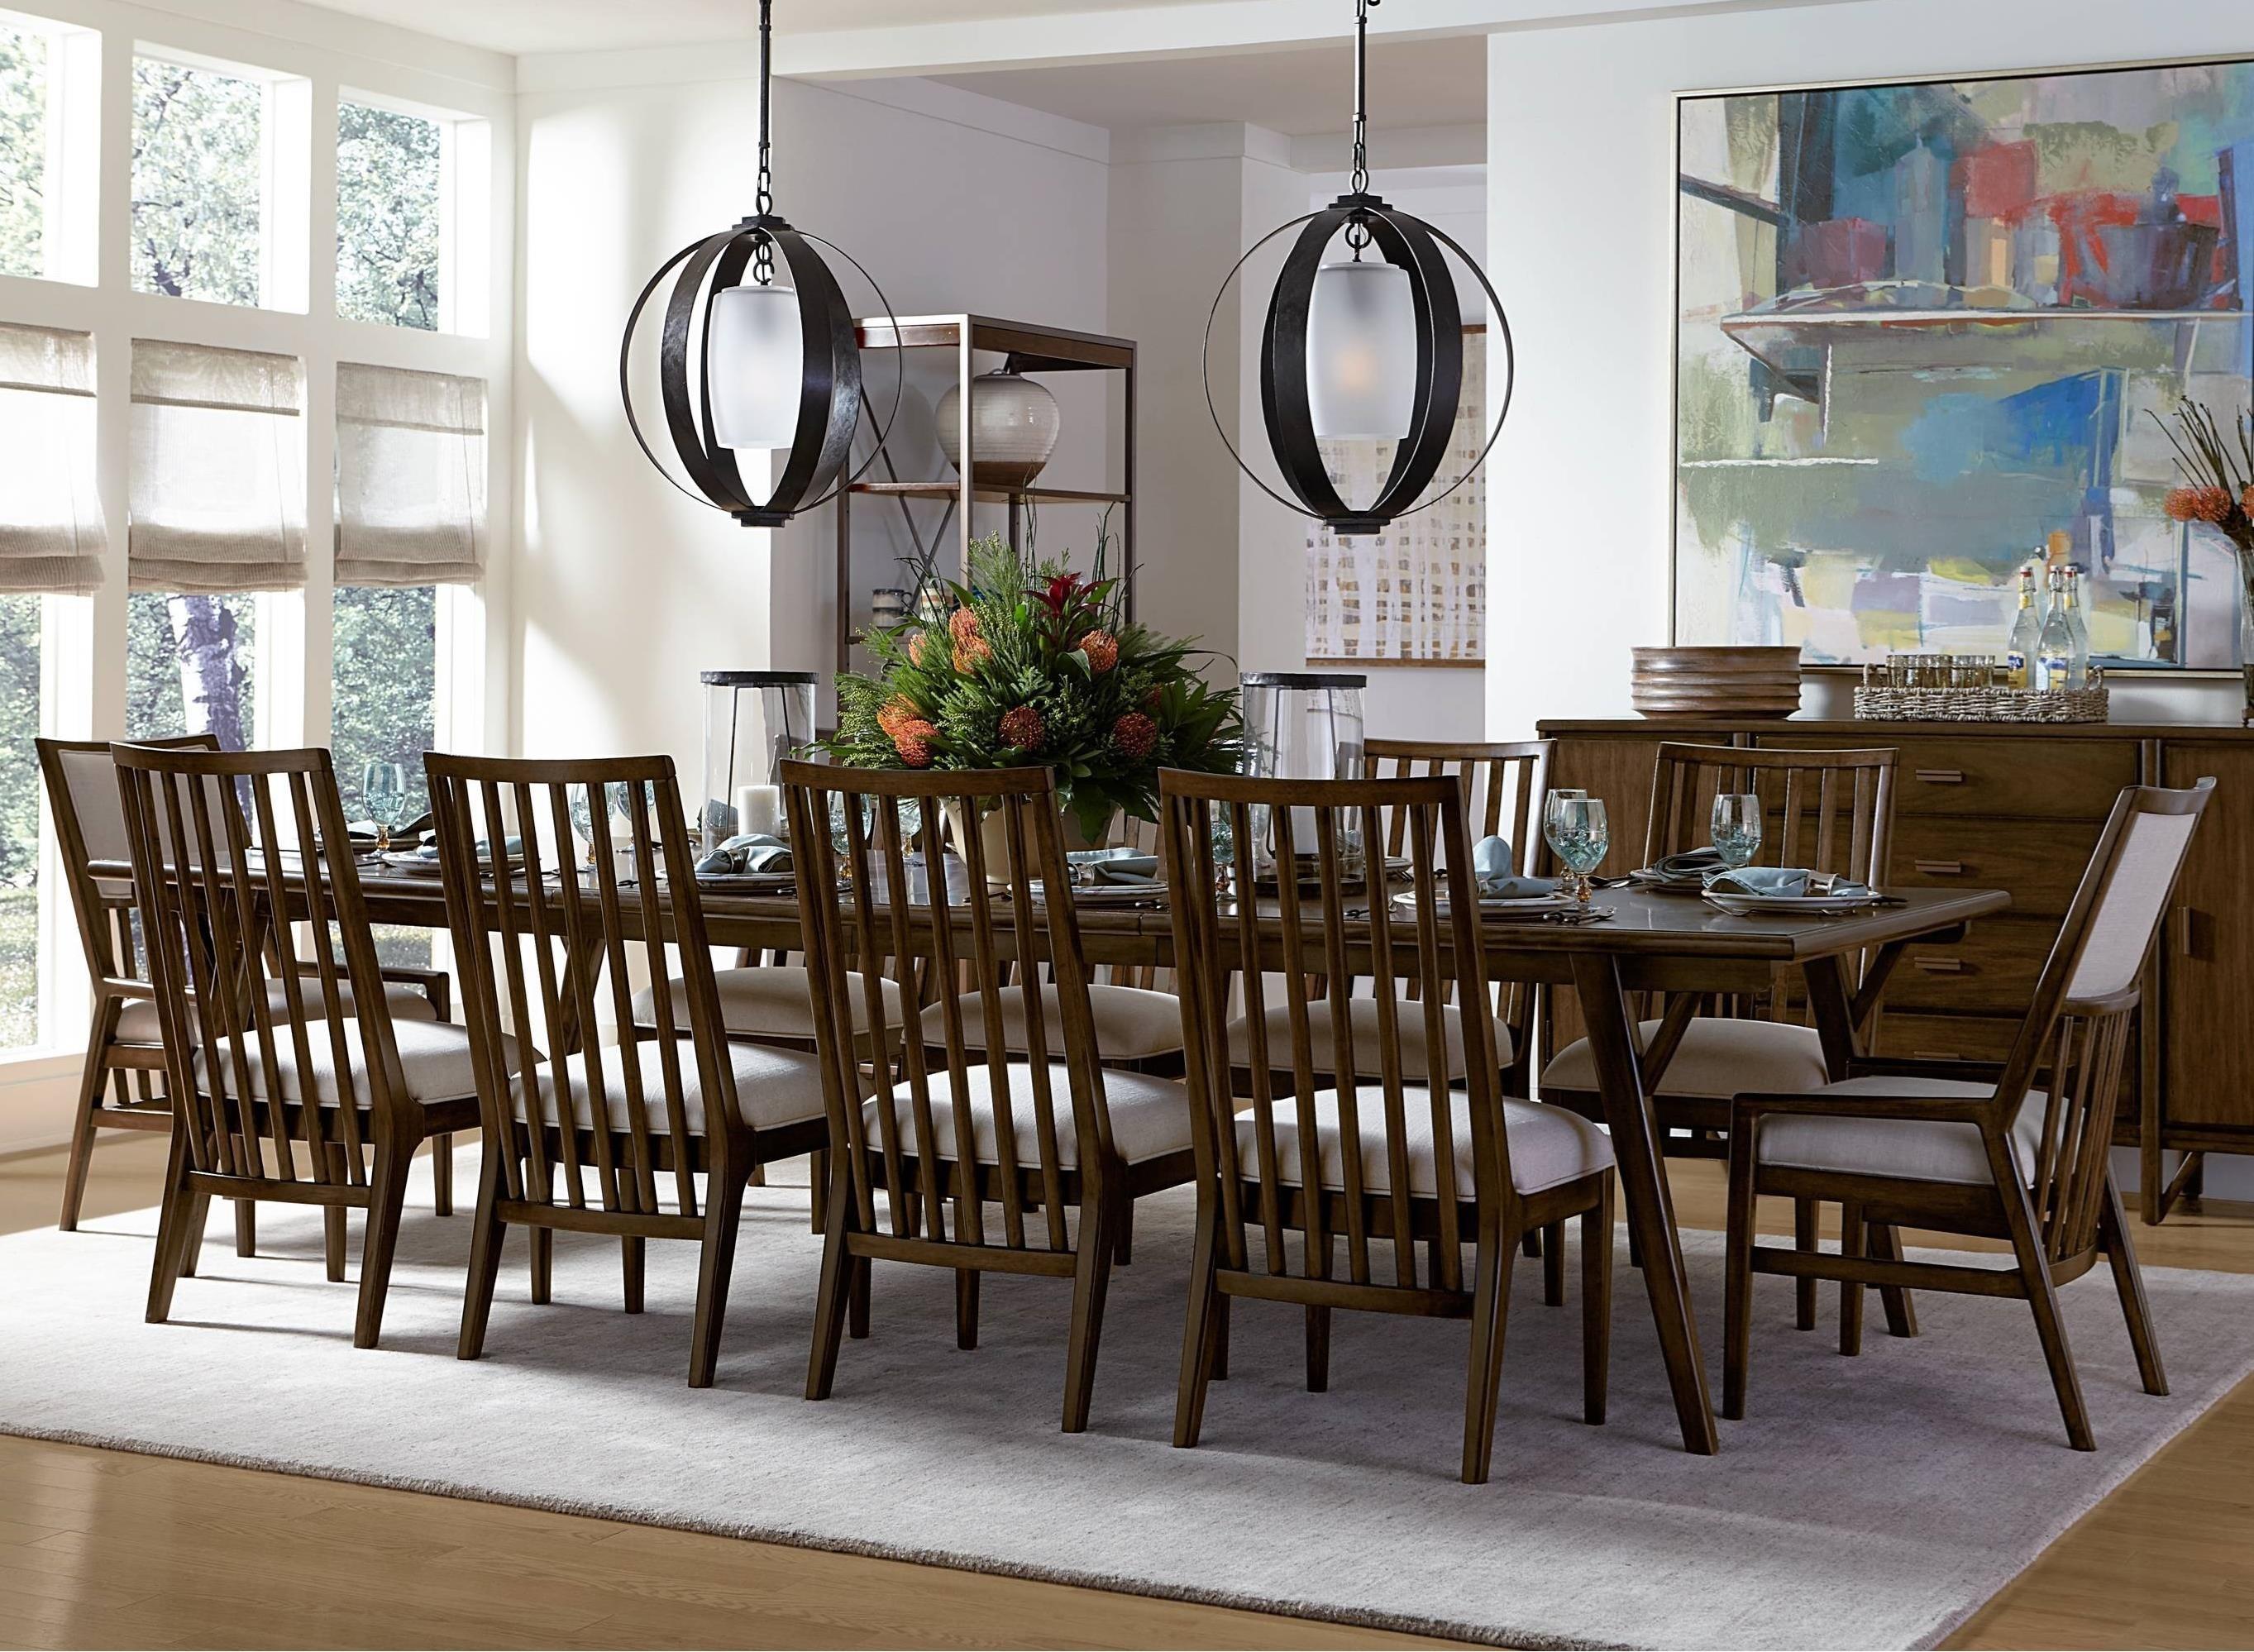 Stanley Furniture Santa Clara 11 Piece Rectangular Dining Table Set   Belfort  Furniture   Dining 7 (or More) Piece Sets